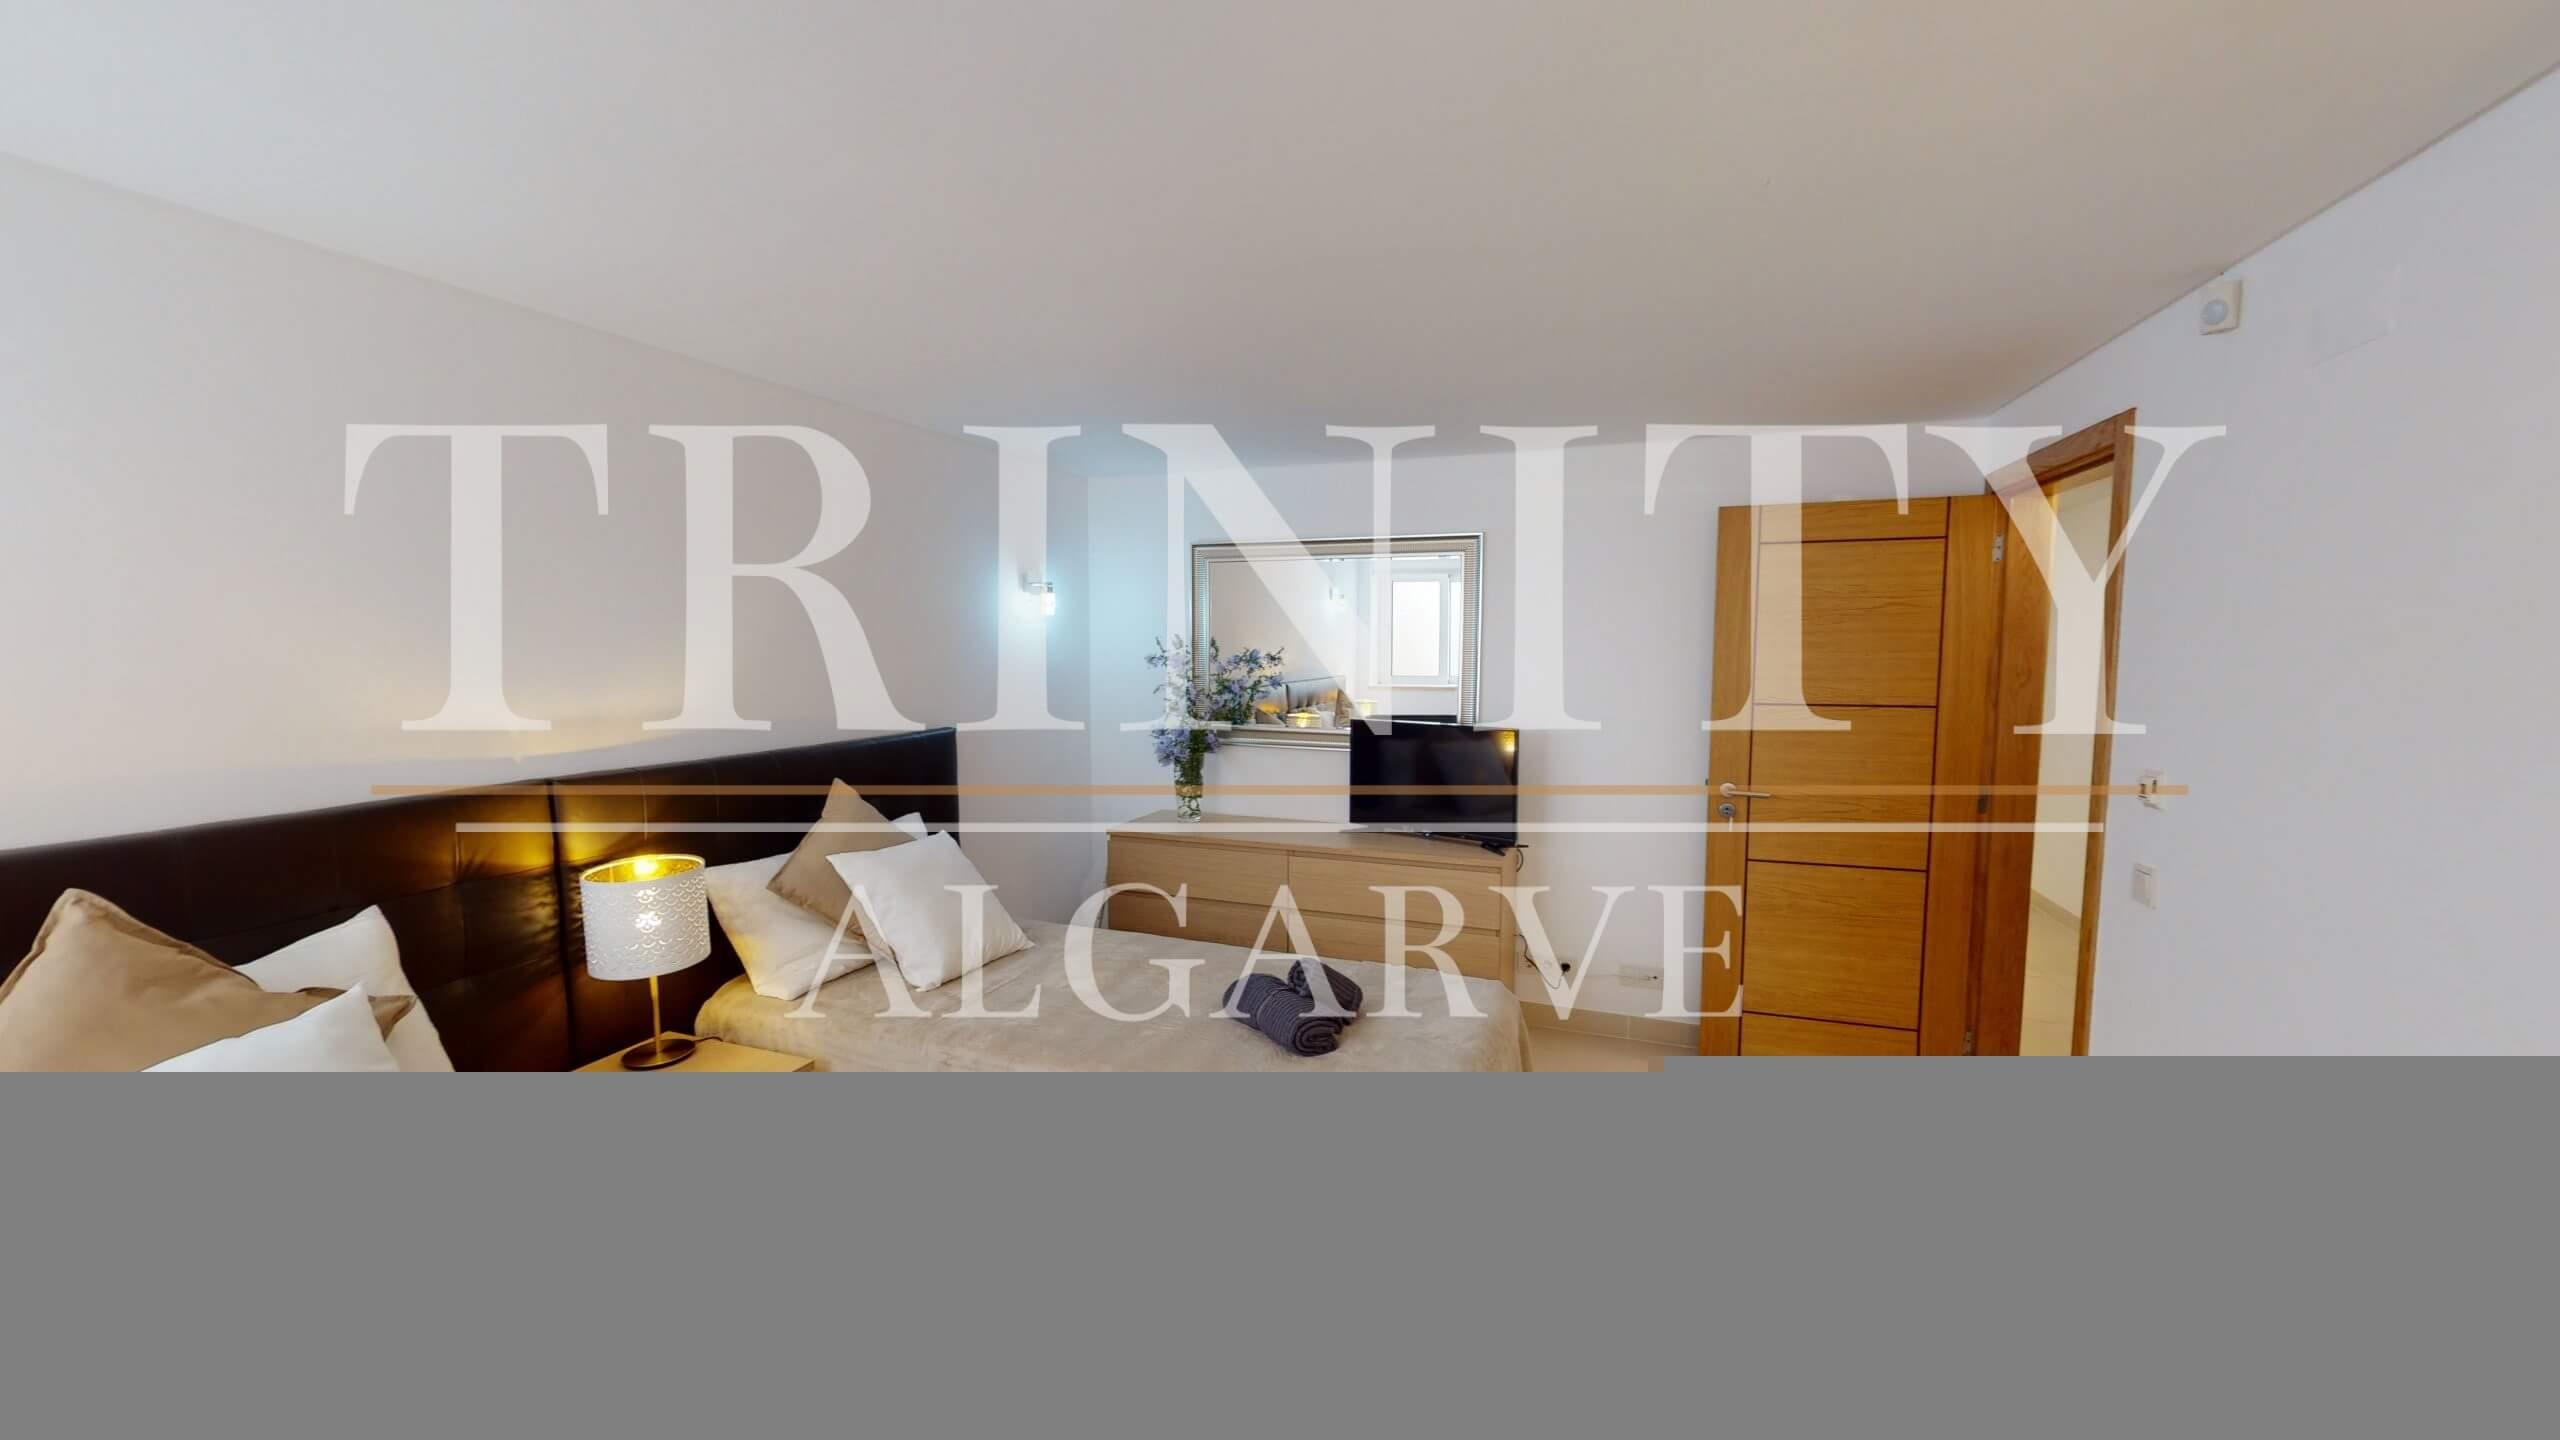 35-The-Crest-by-Trinity-Algarve-07032020_115124